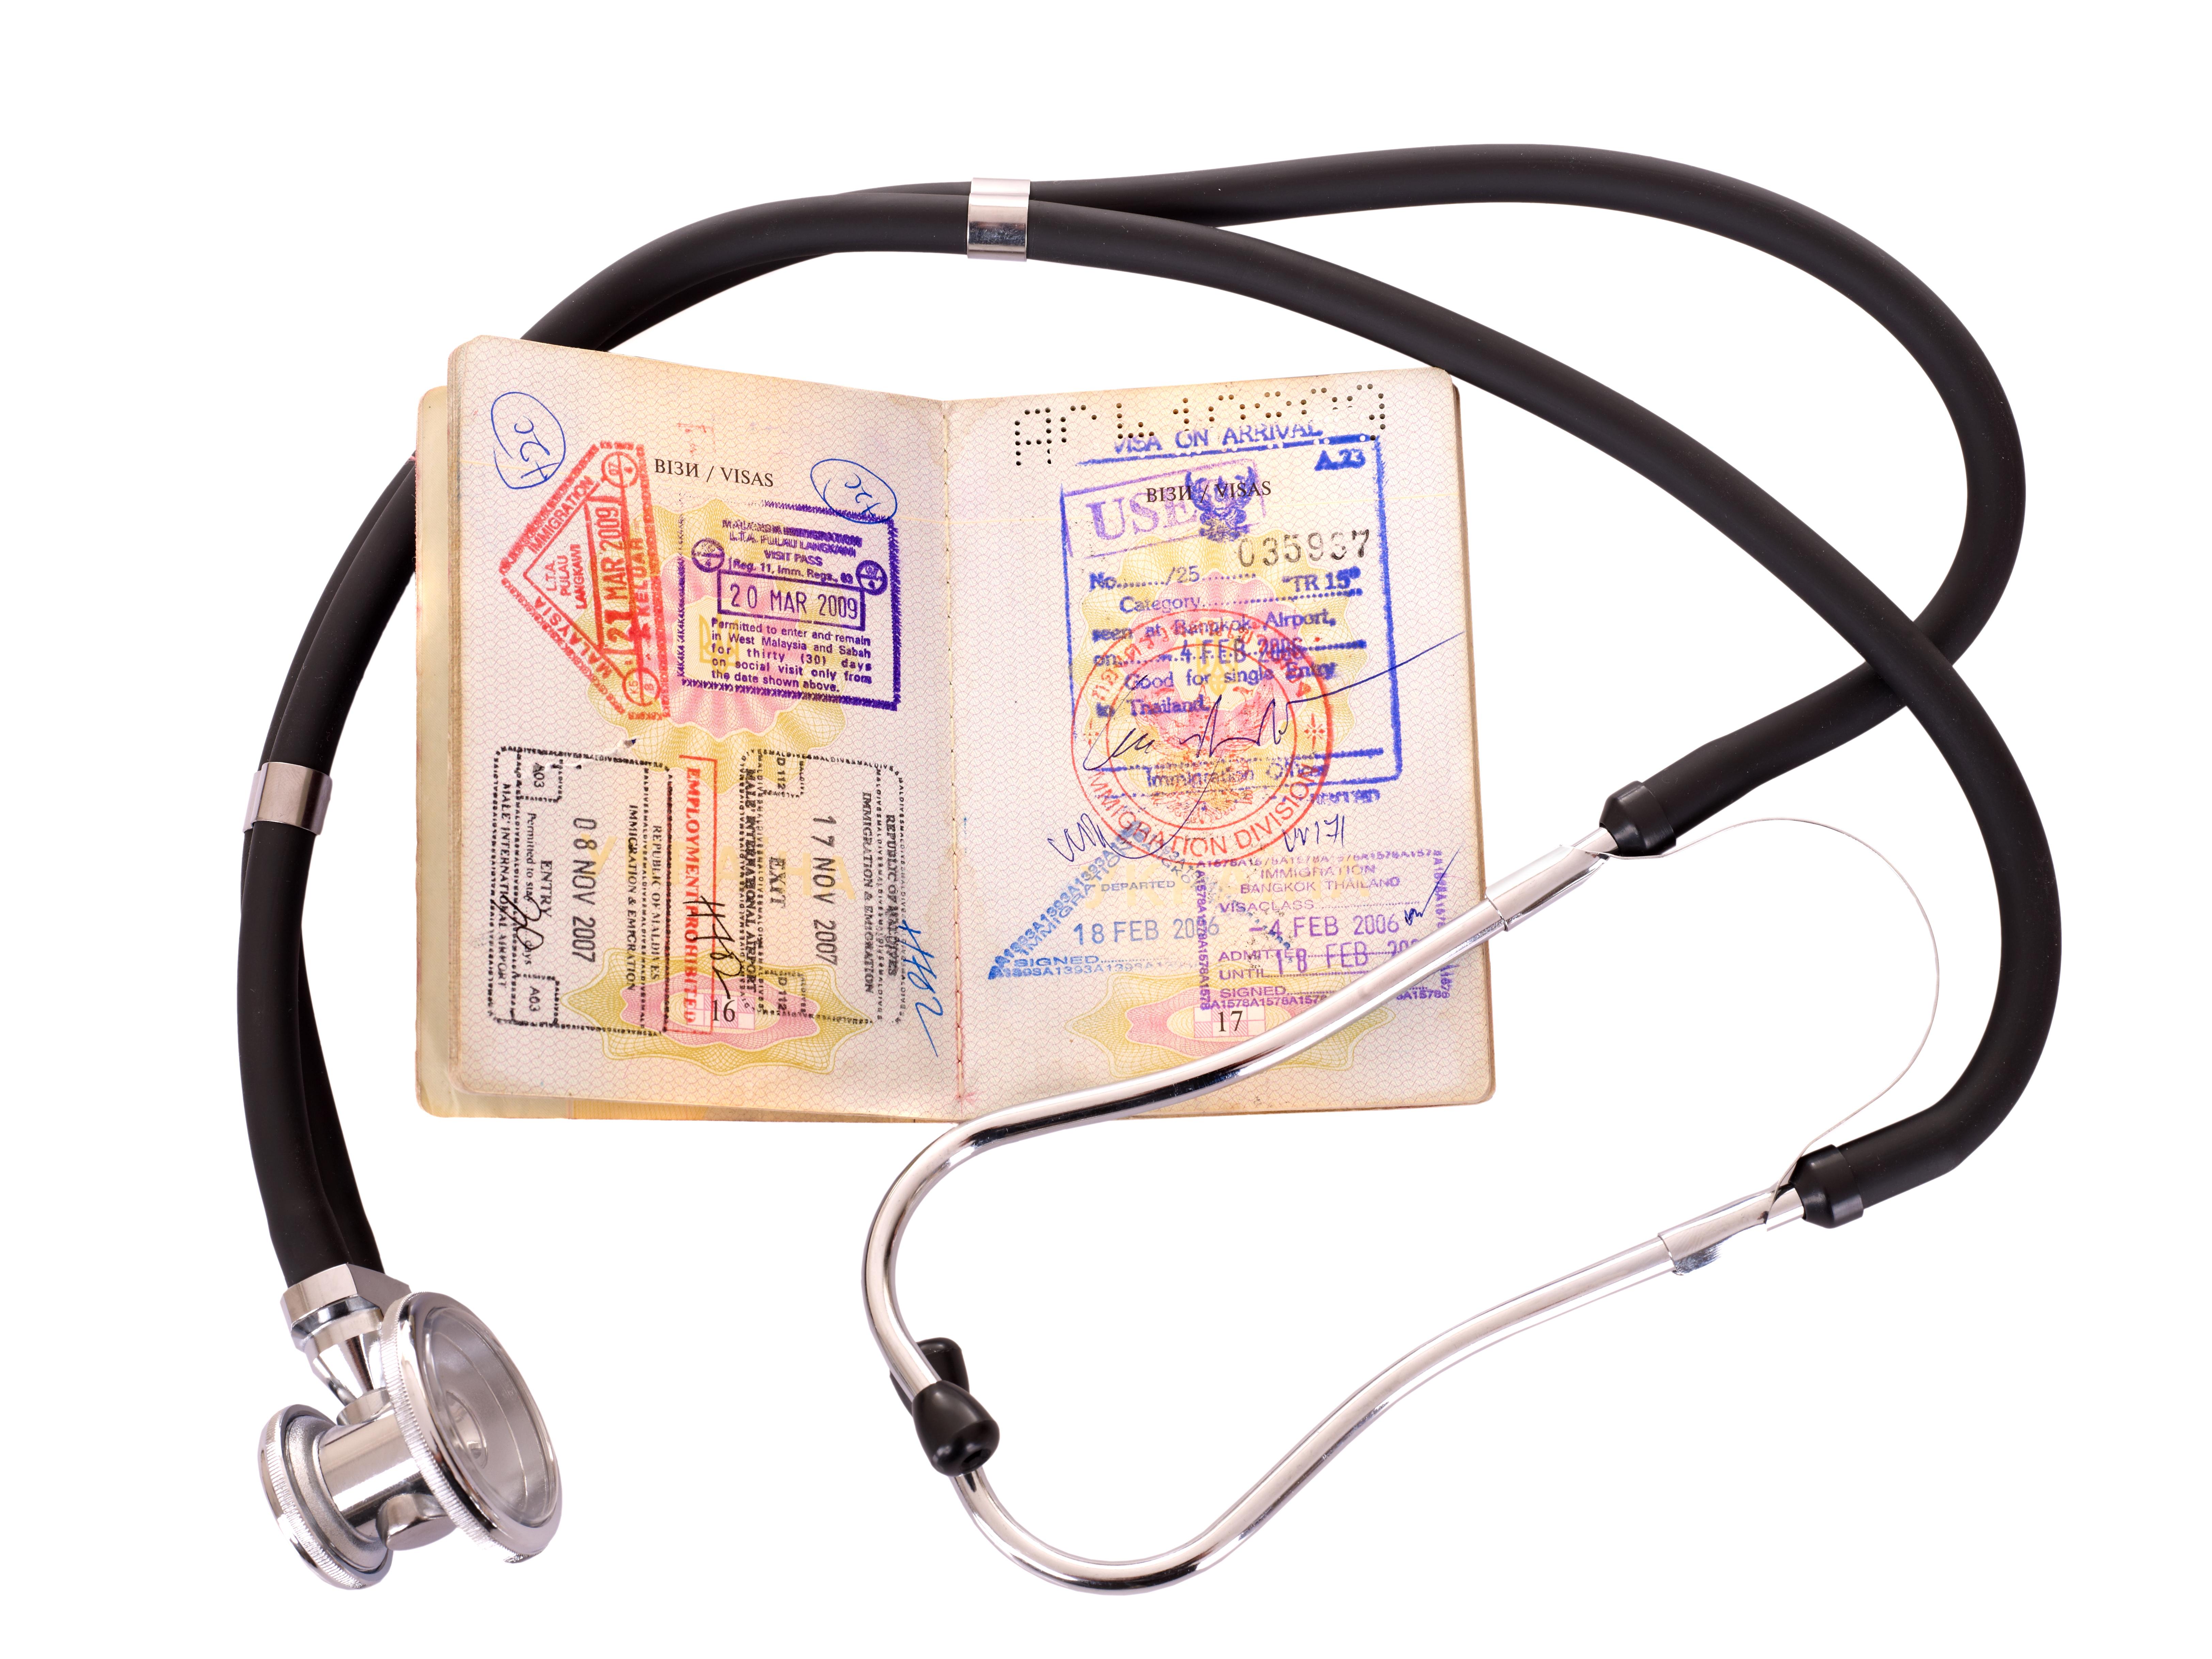 stethoscope and passport